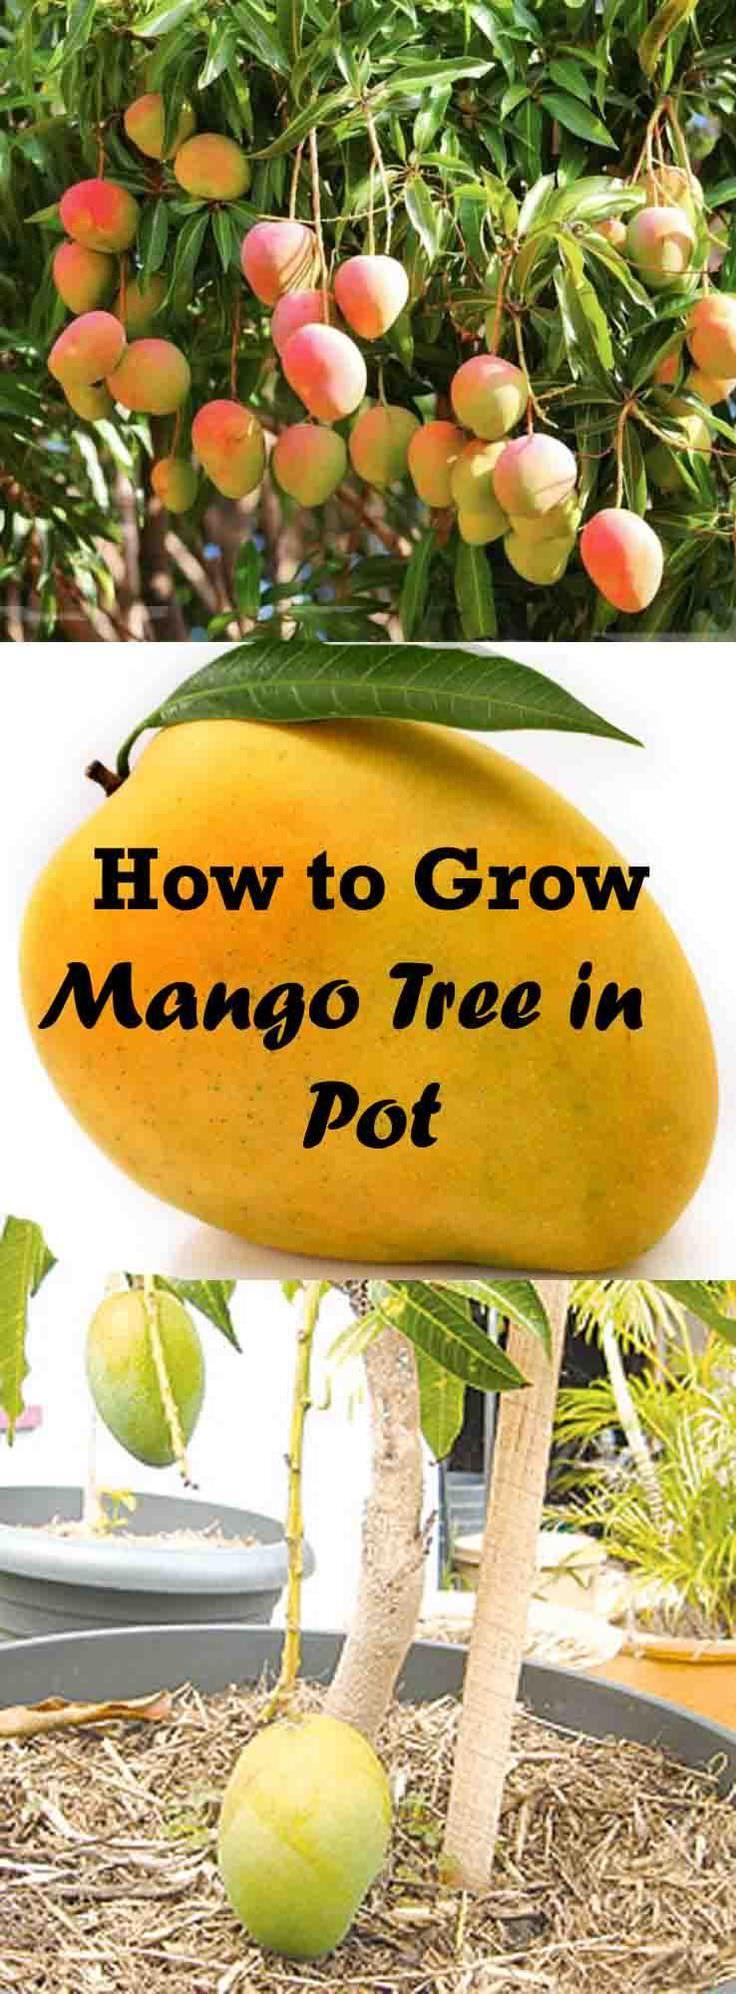 How To Grow Mango Tree In Pot